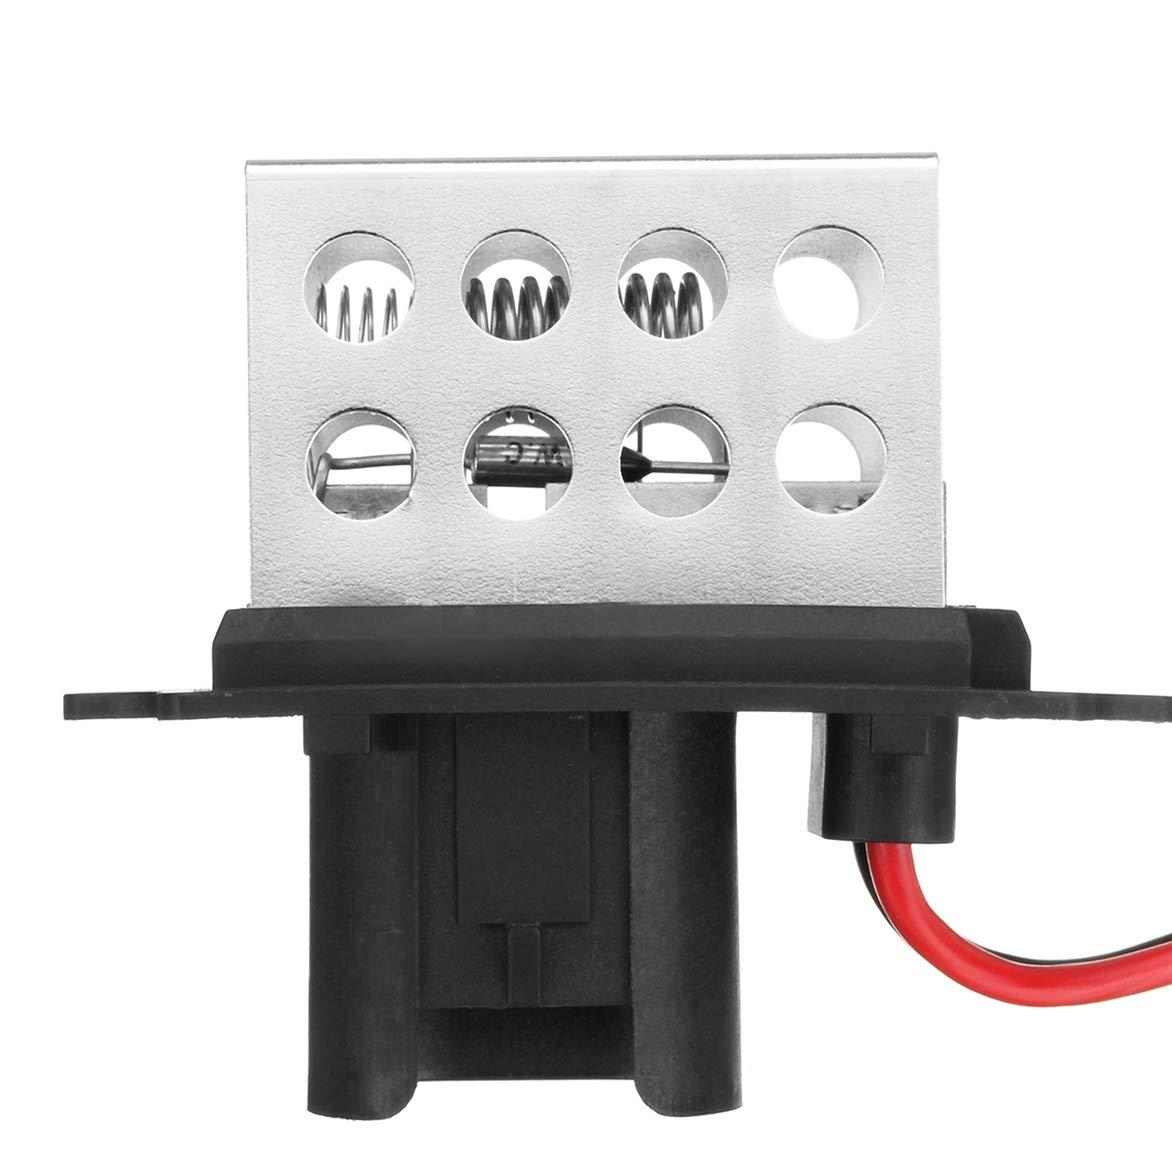 SODIAL 5Pins Car Blower Fan Motor Heater Resistor 7701034875 27100-00Qac For Renault Clio Mk1 /& Kangoo 7701034875